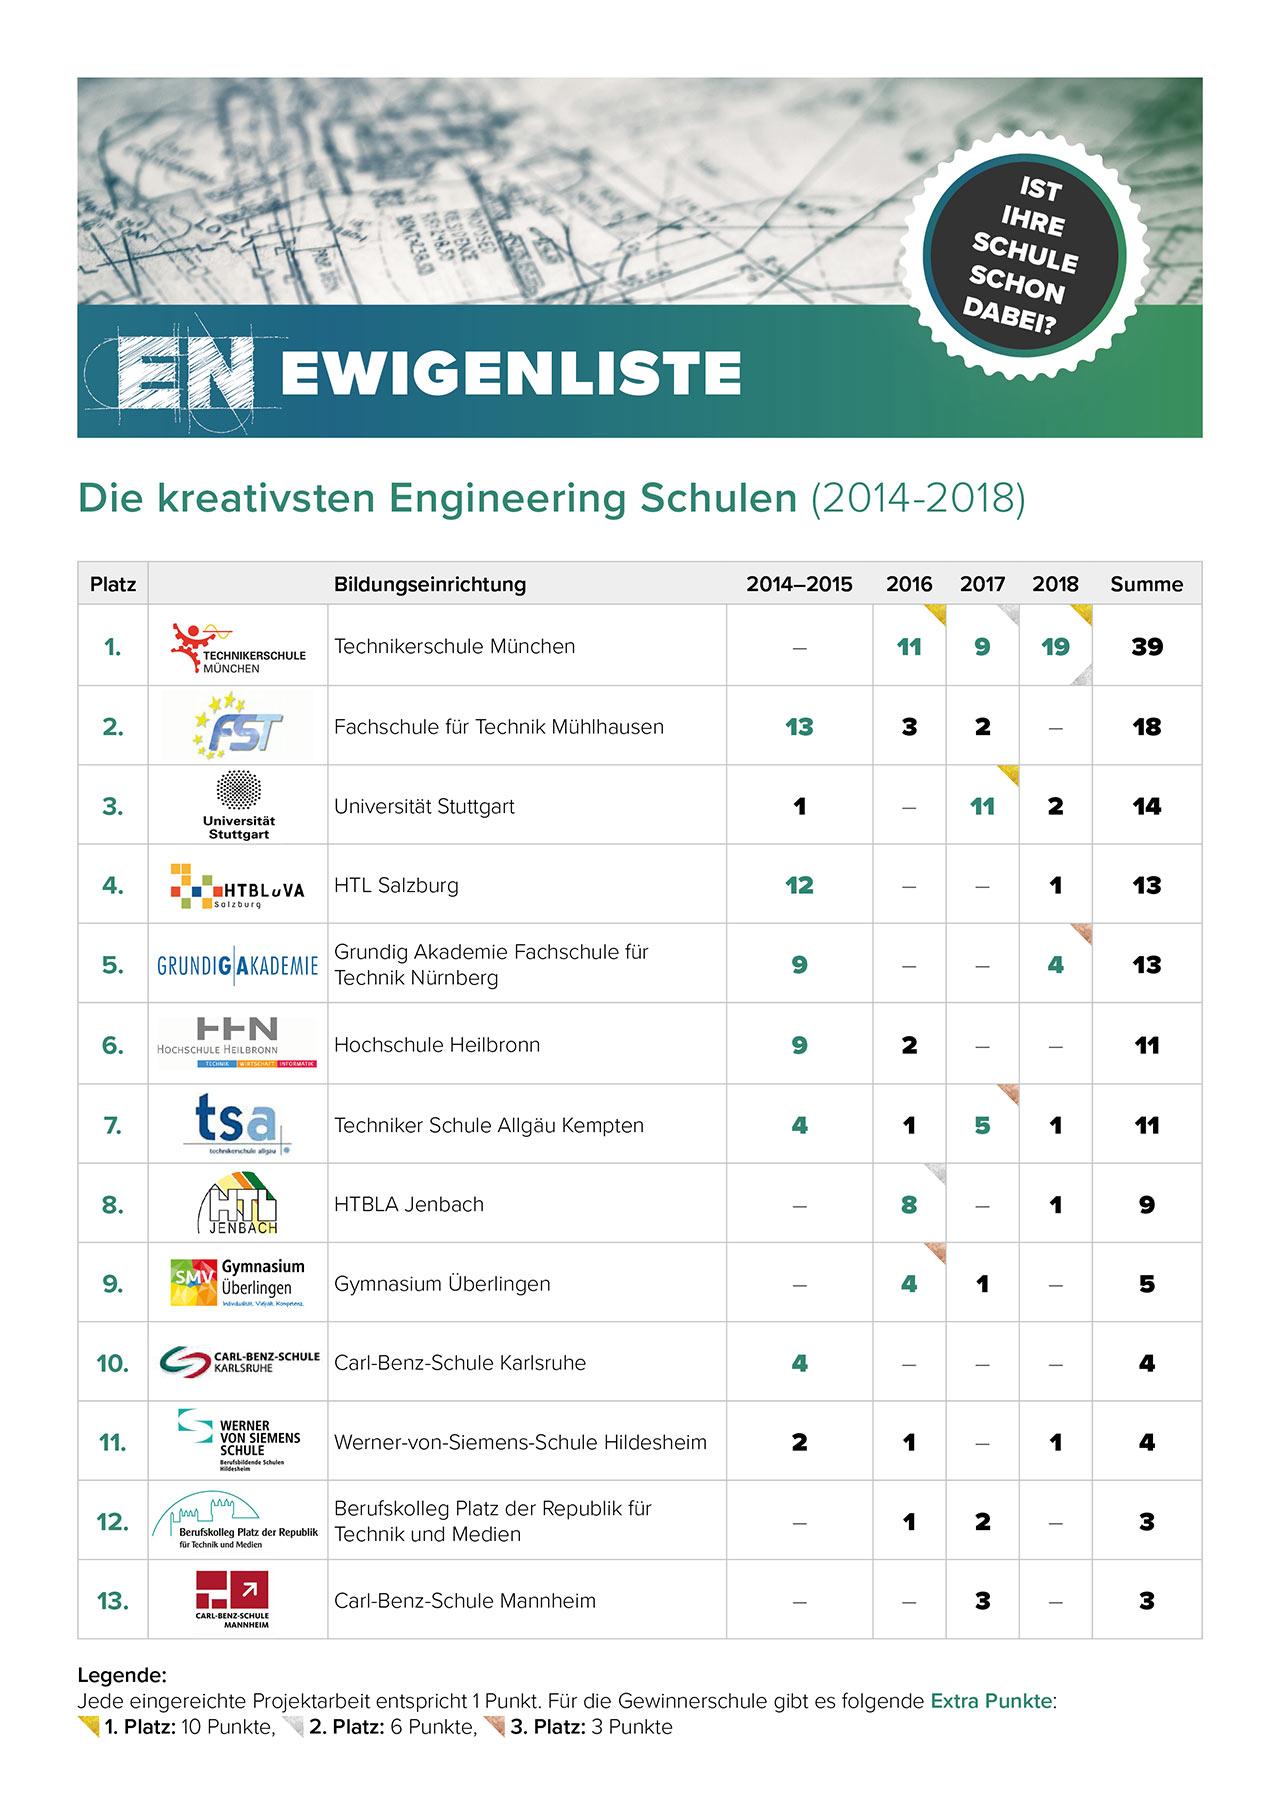 Ewigenliste 2014-2018